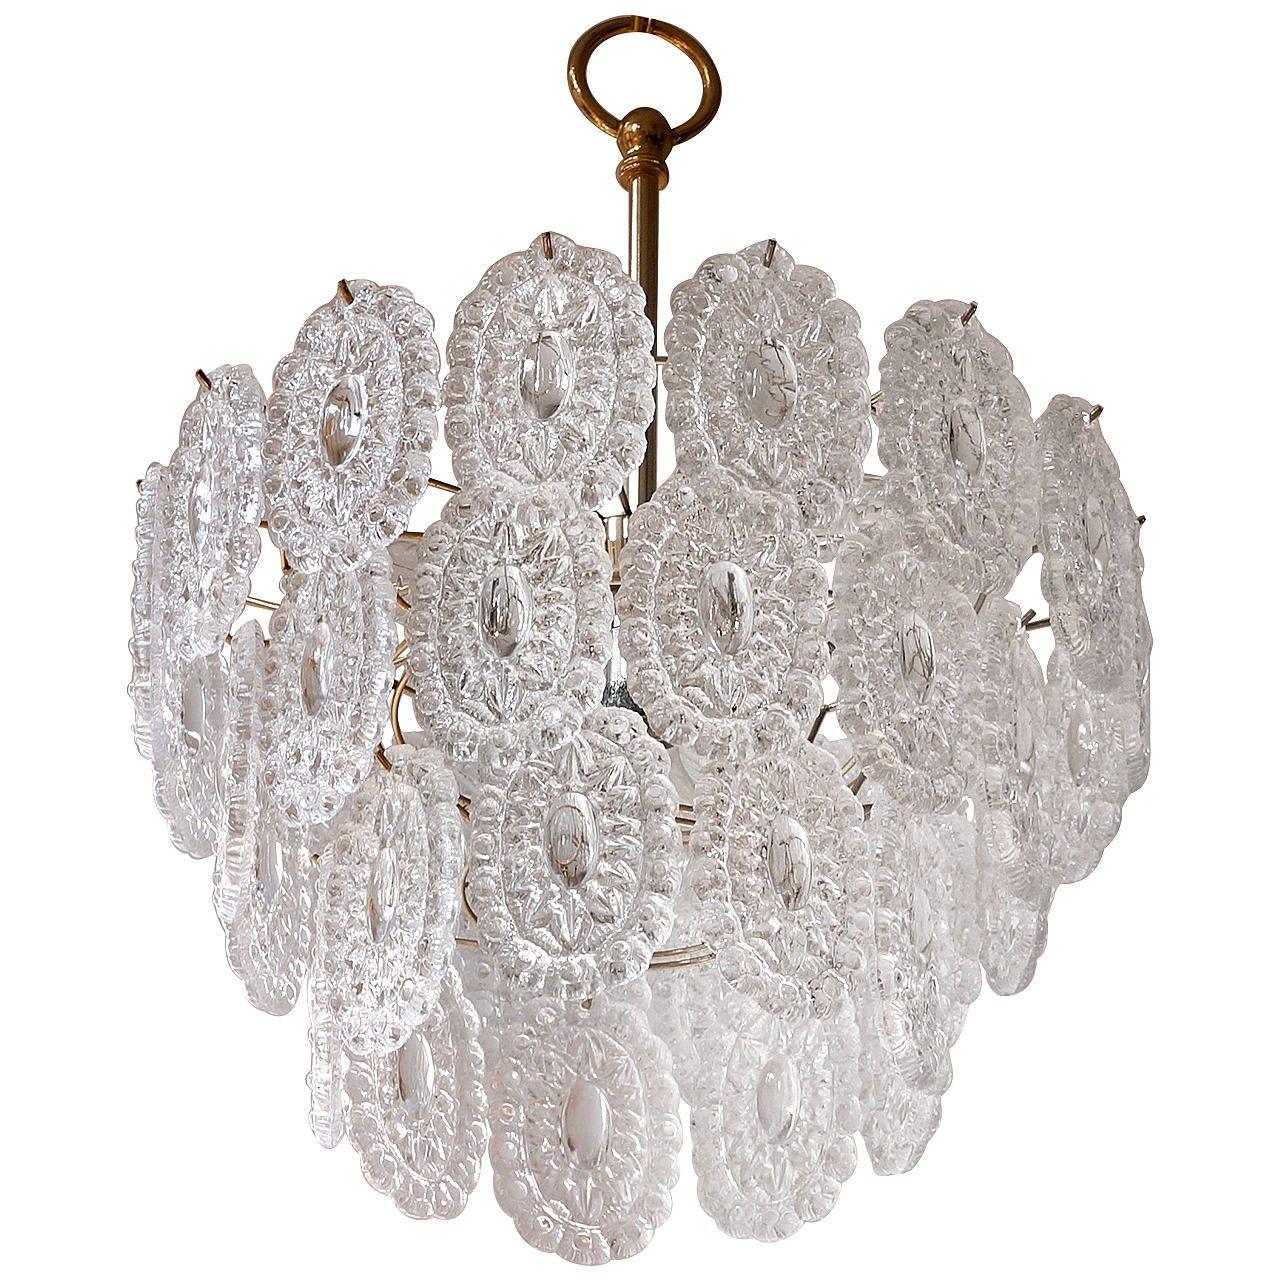 Three doria crystal glass flush mount light chandeliers flush